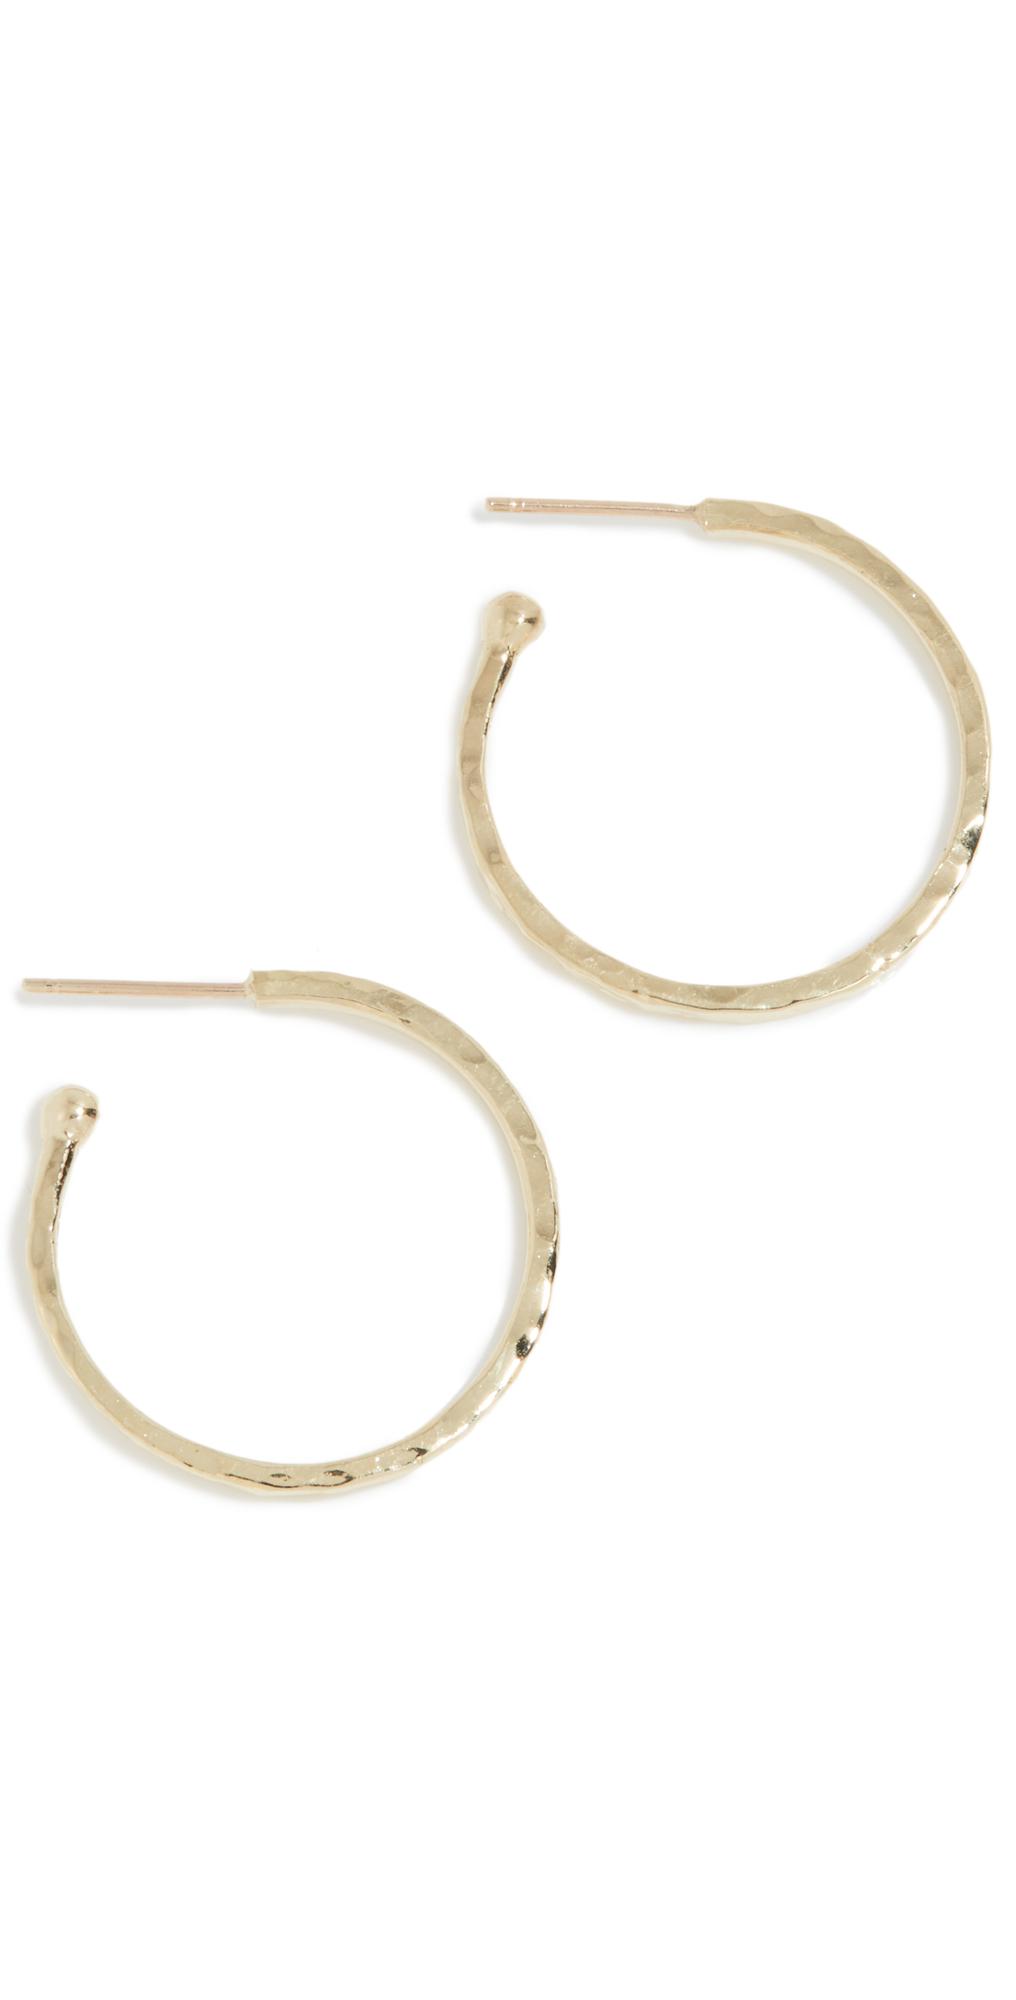 Jennifer Meyer Jewelry 18k Gold Small Hammered Bangle Hoops